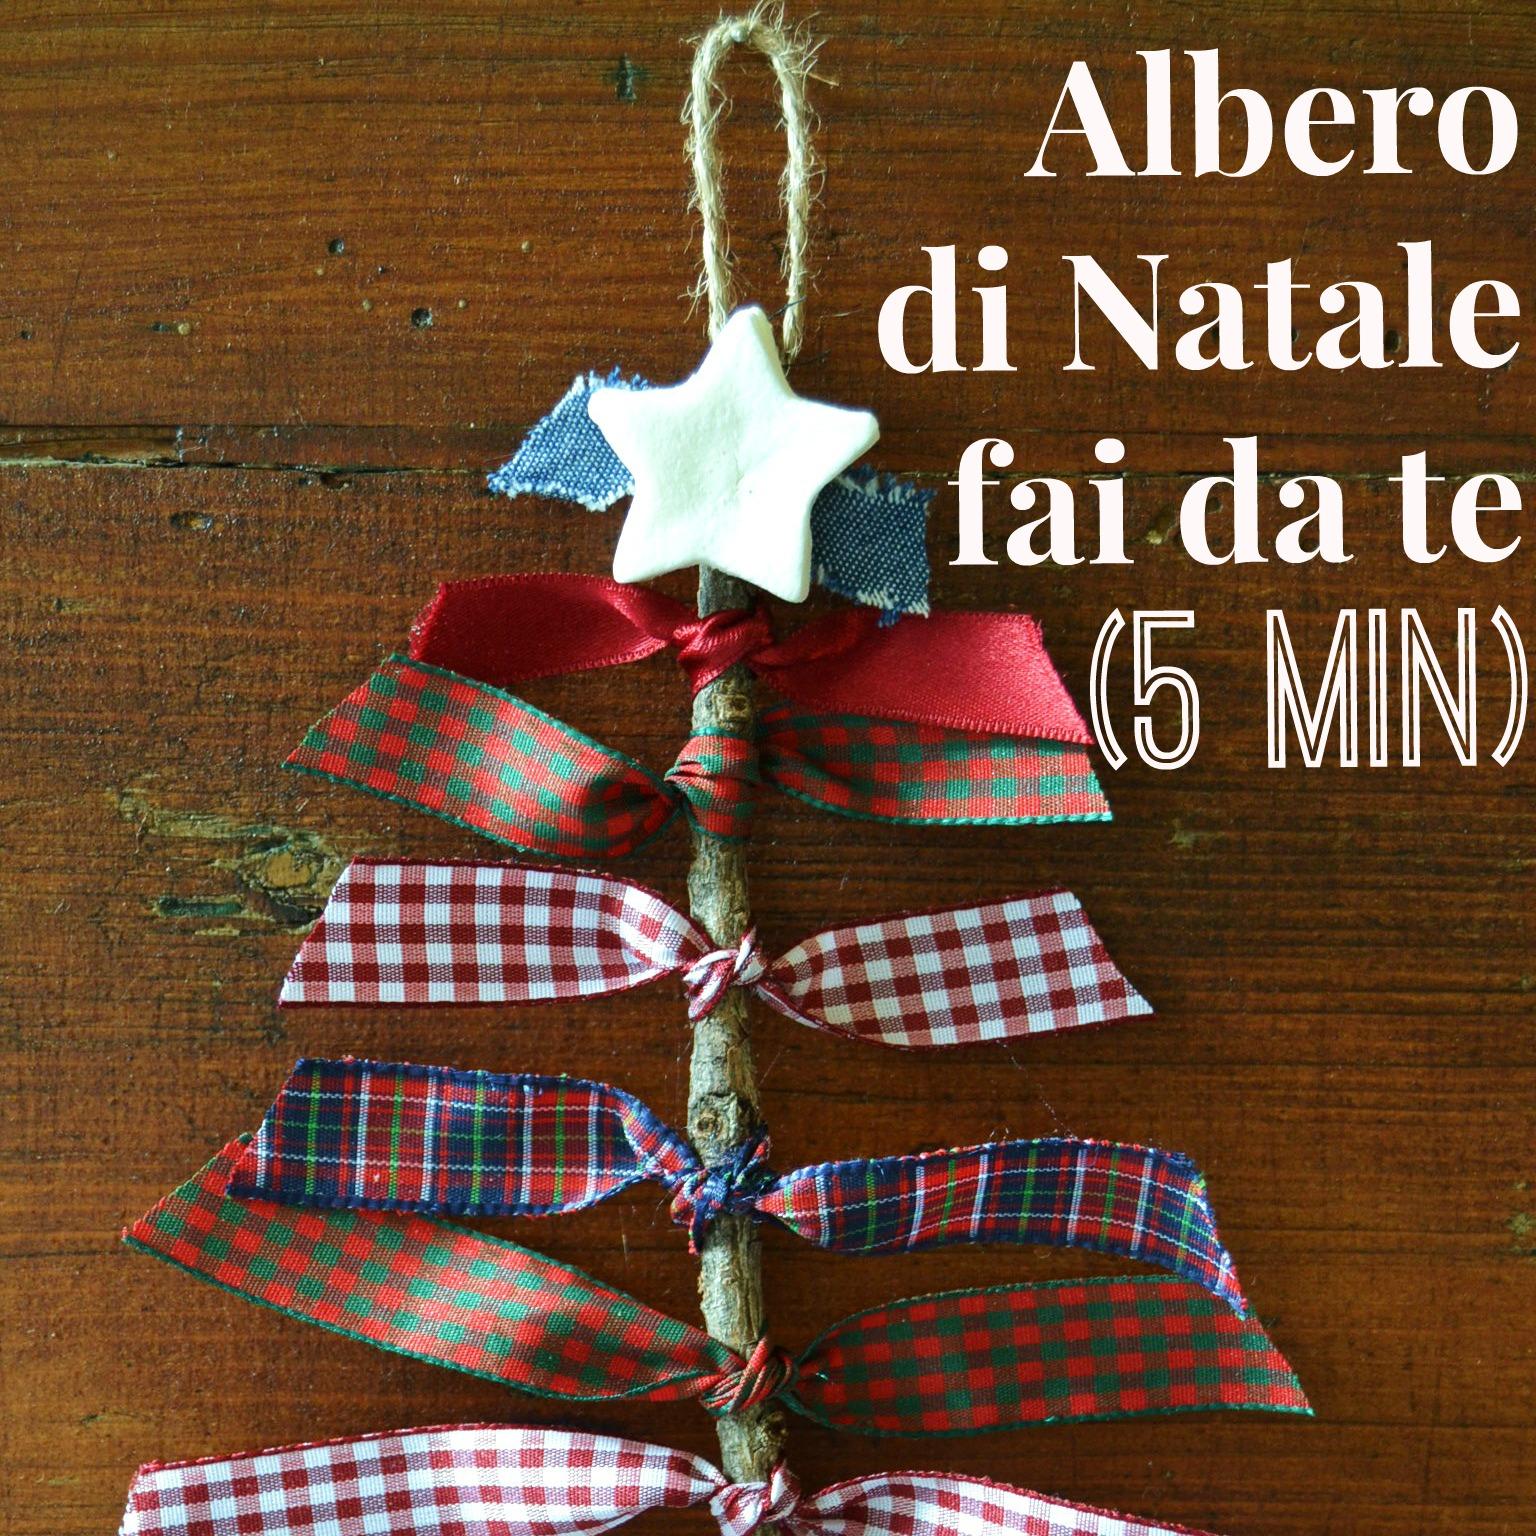 Albero di natale fai da te in 5 minuti babygreen for Decorazioni albero di natale fai da te